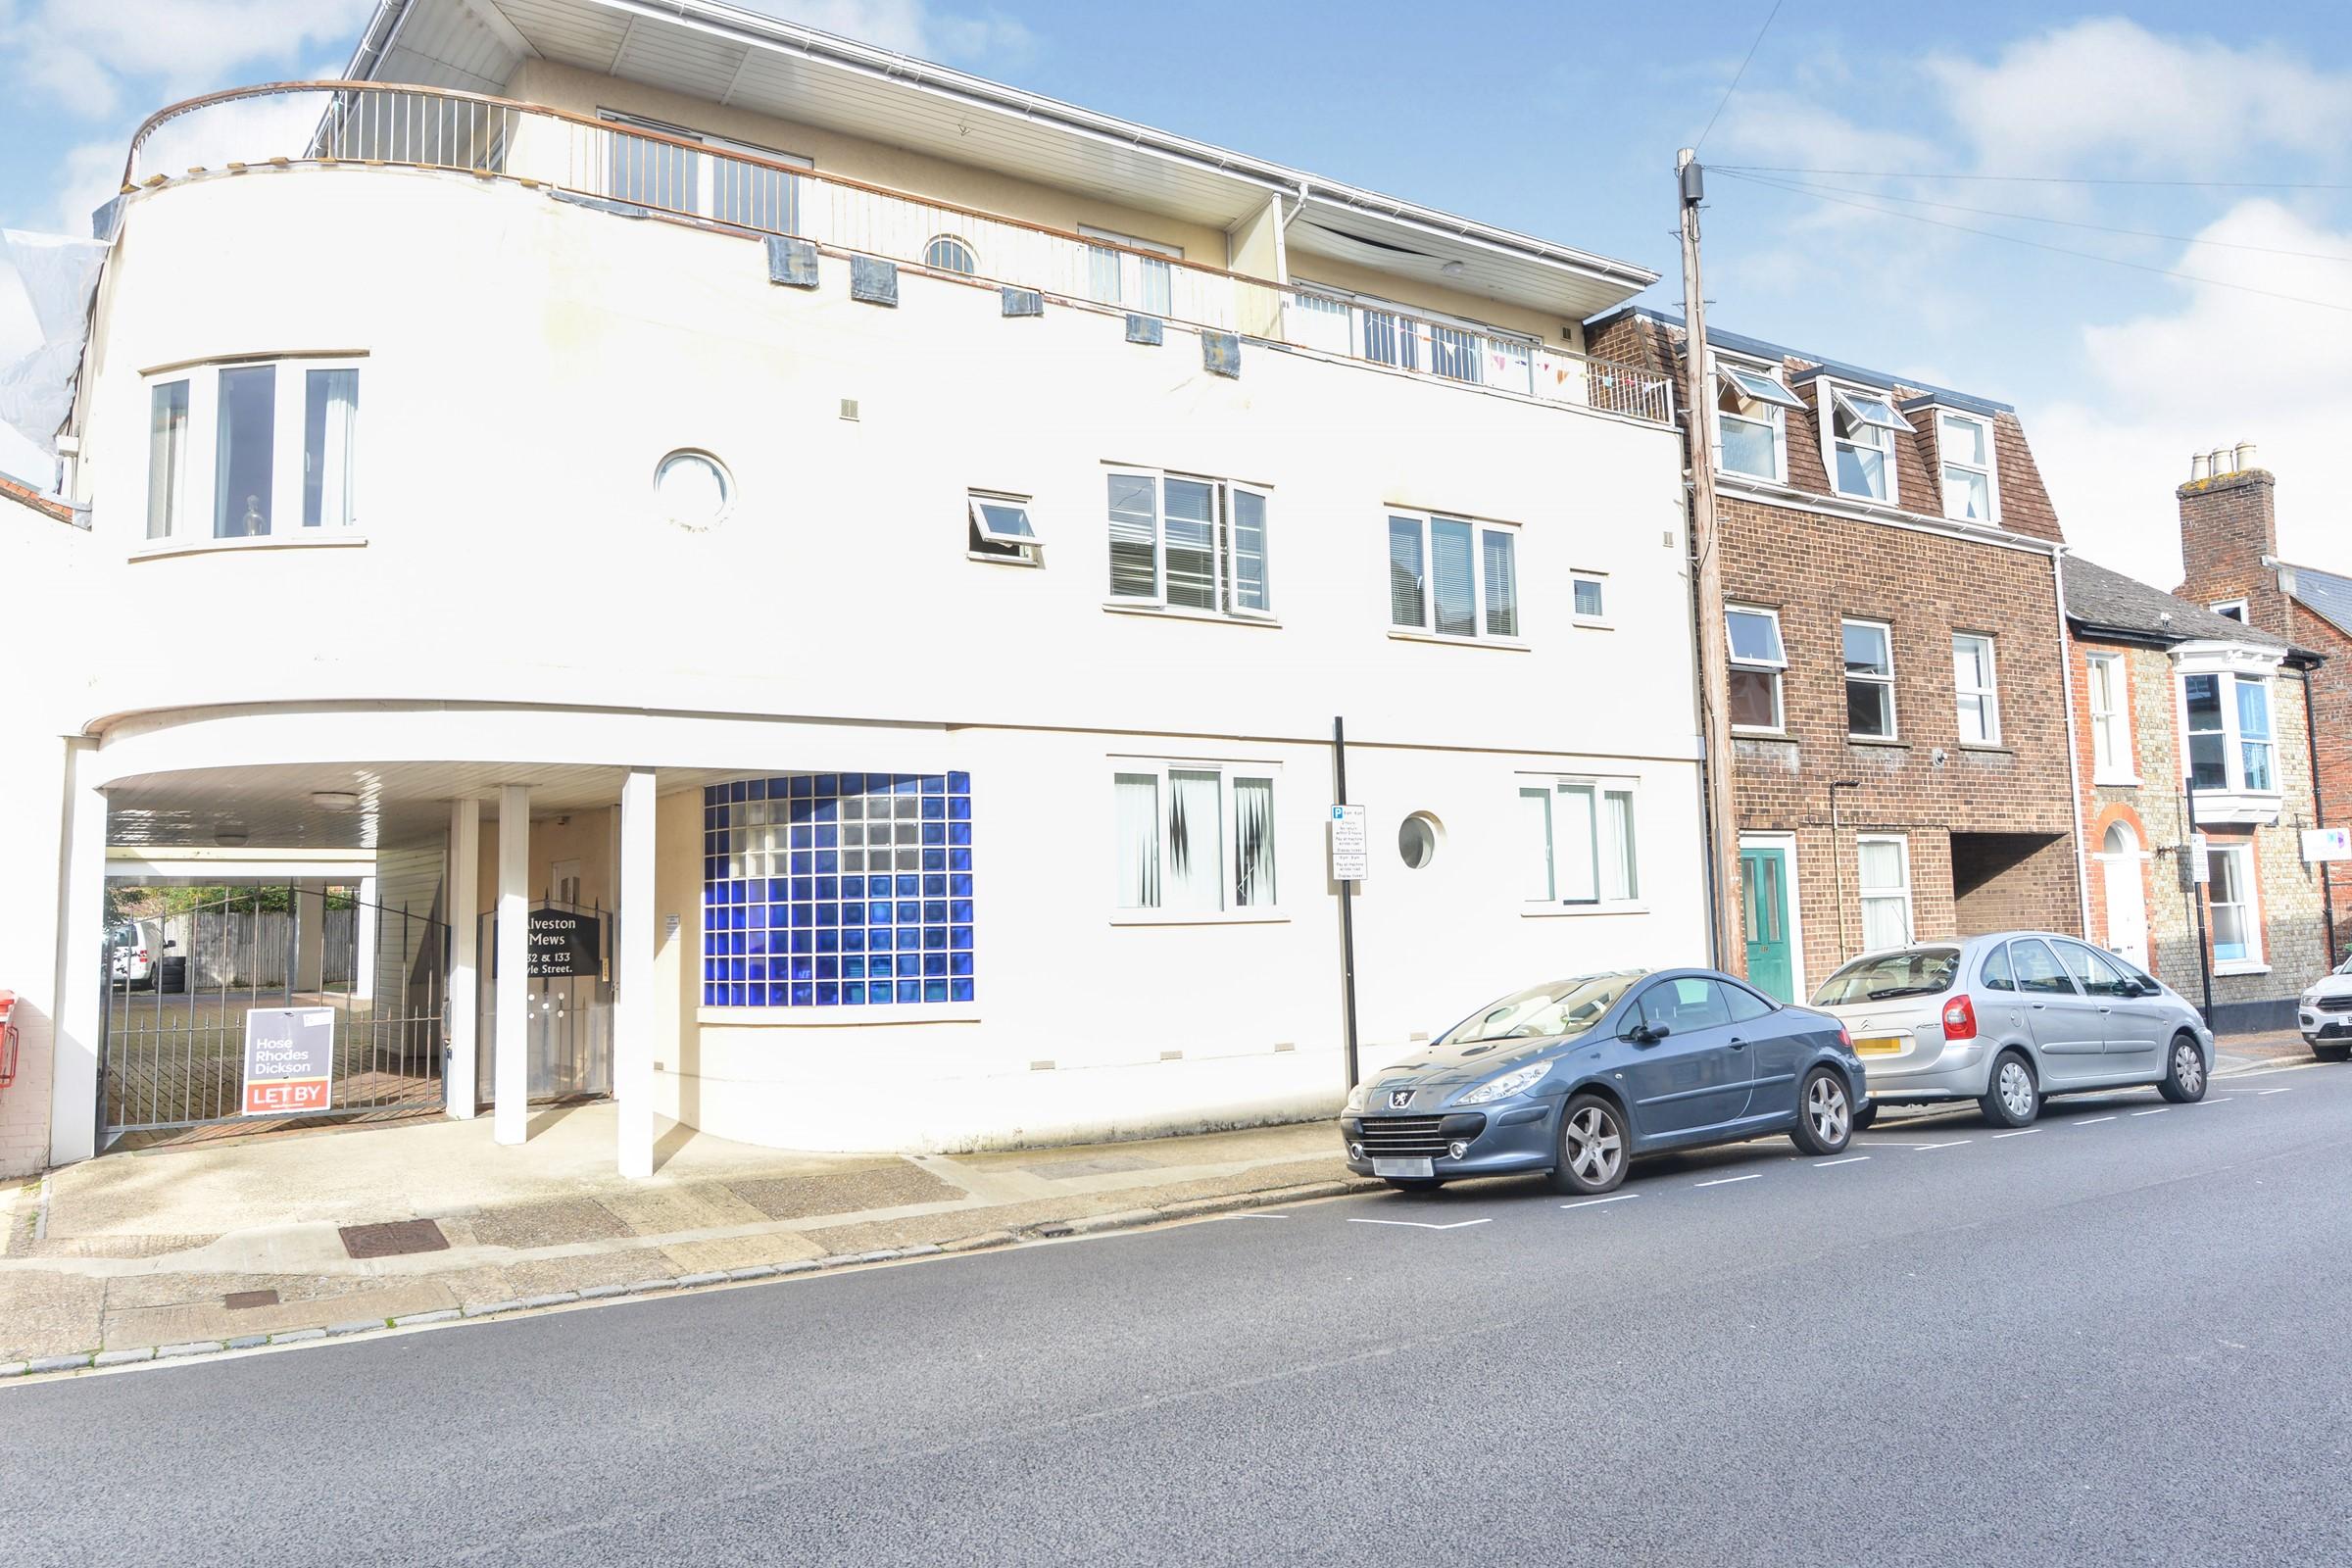 Pyle Street, Newport, Isle of Wight, PO30